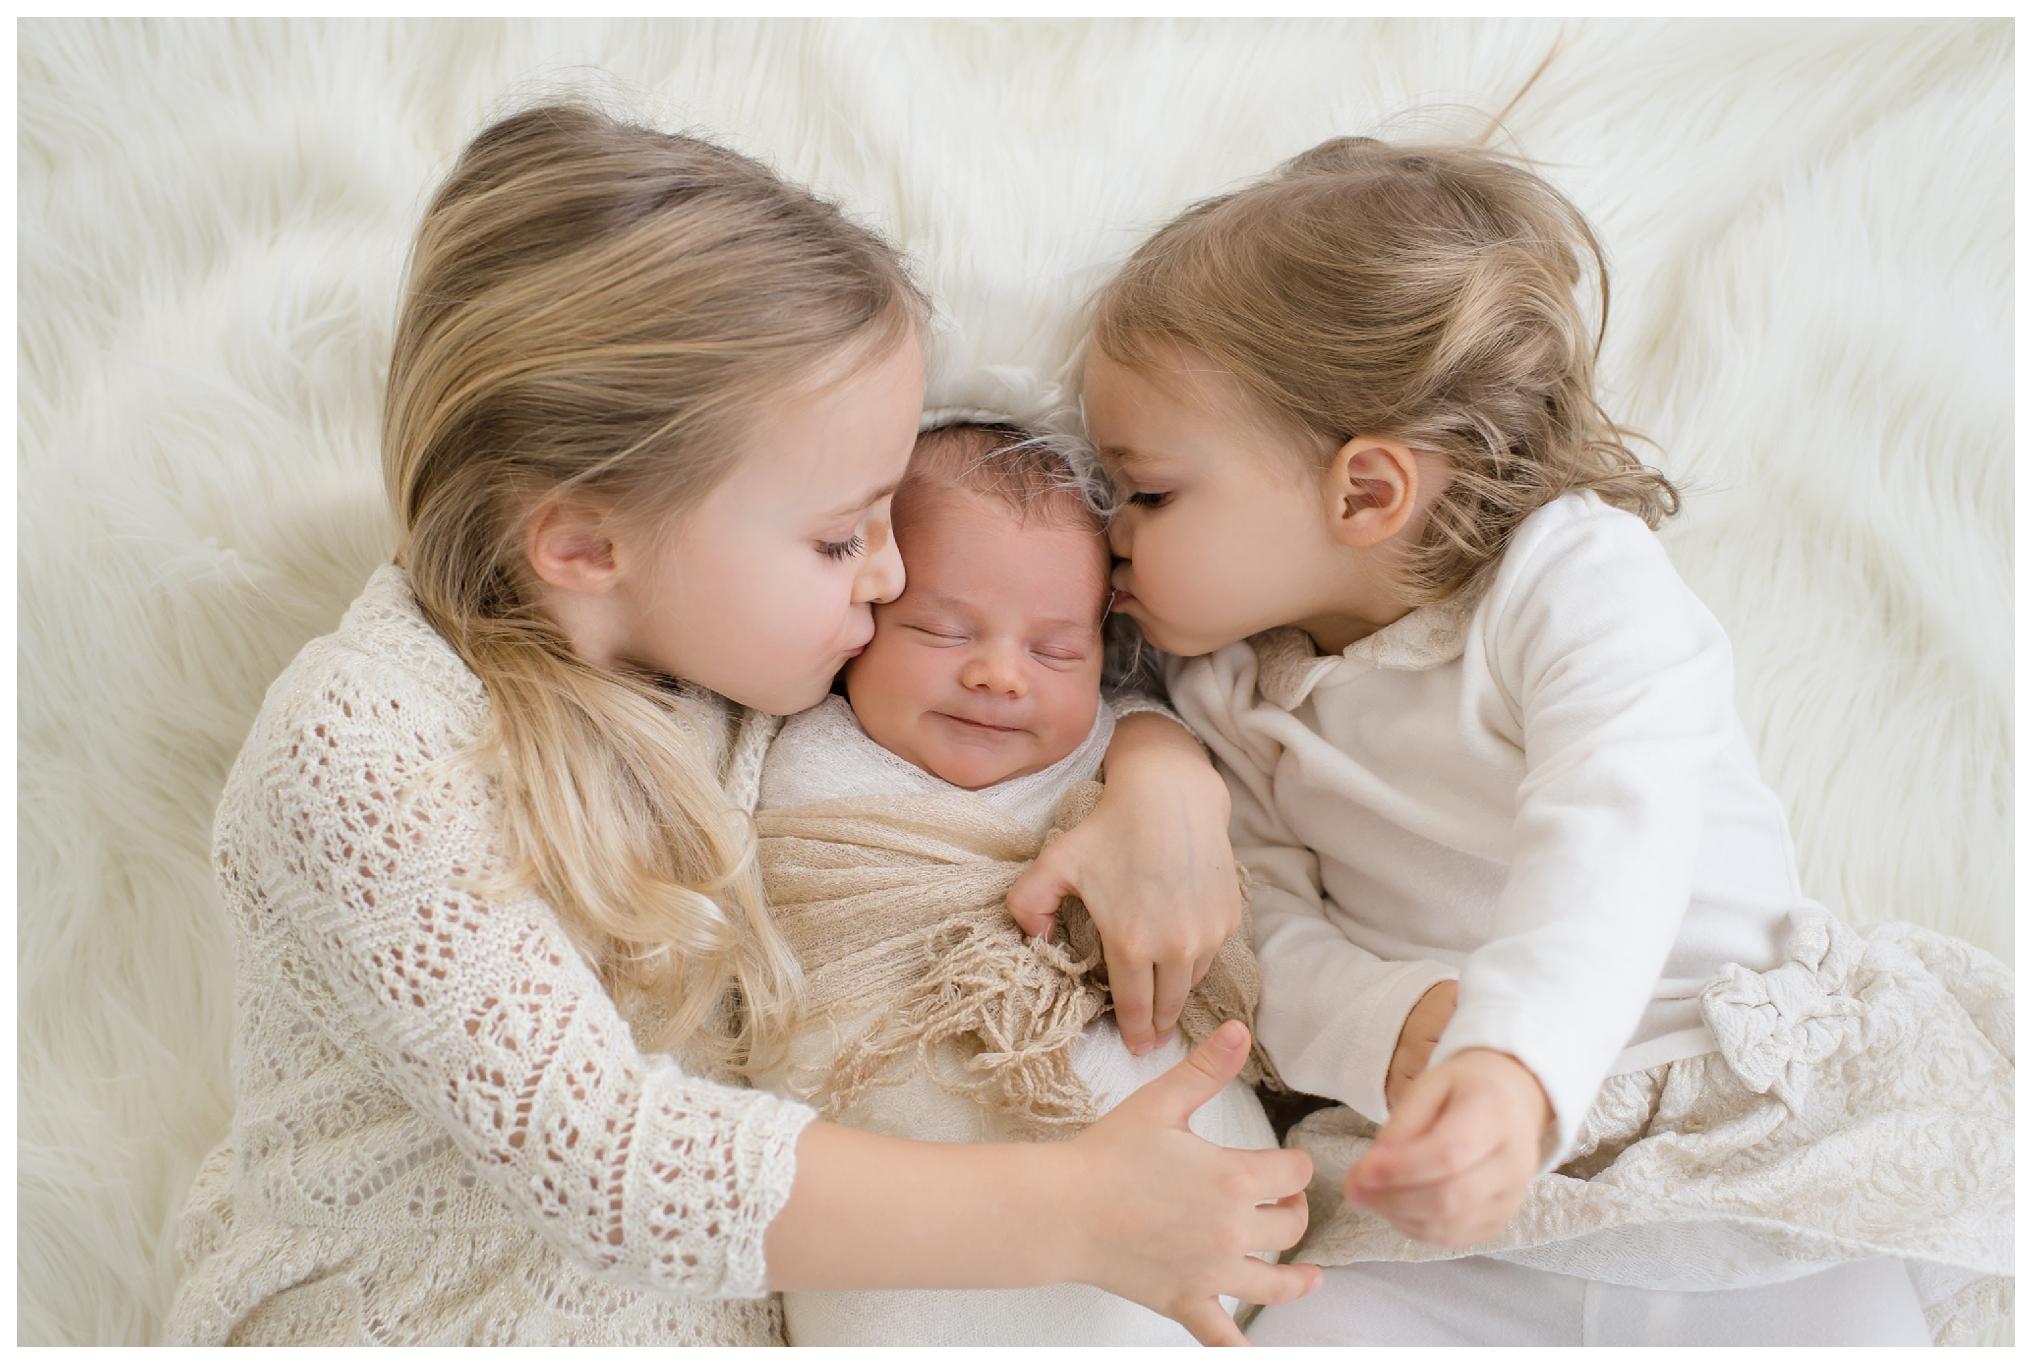 Newborn-Photographer-Sweet_Light-Portraits_0559.jpg